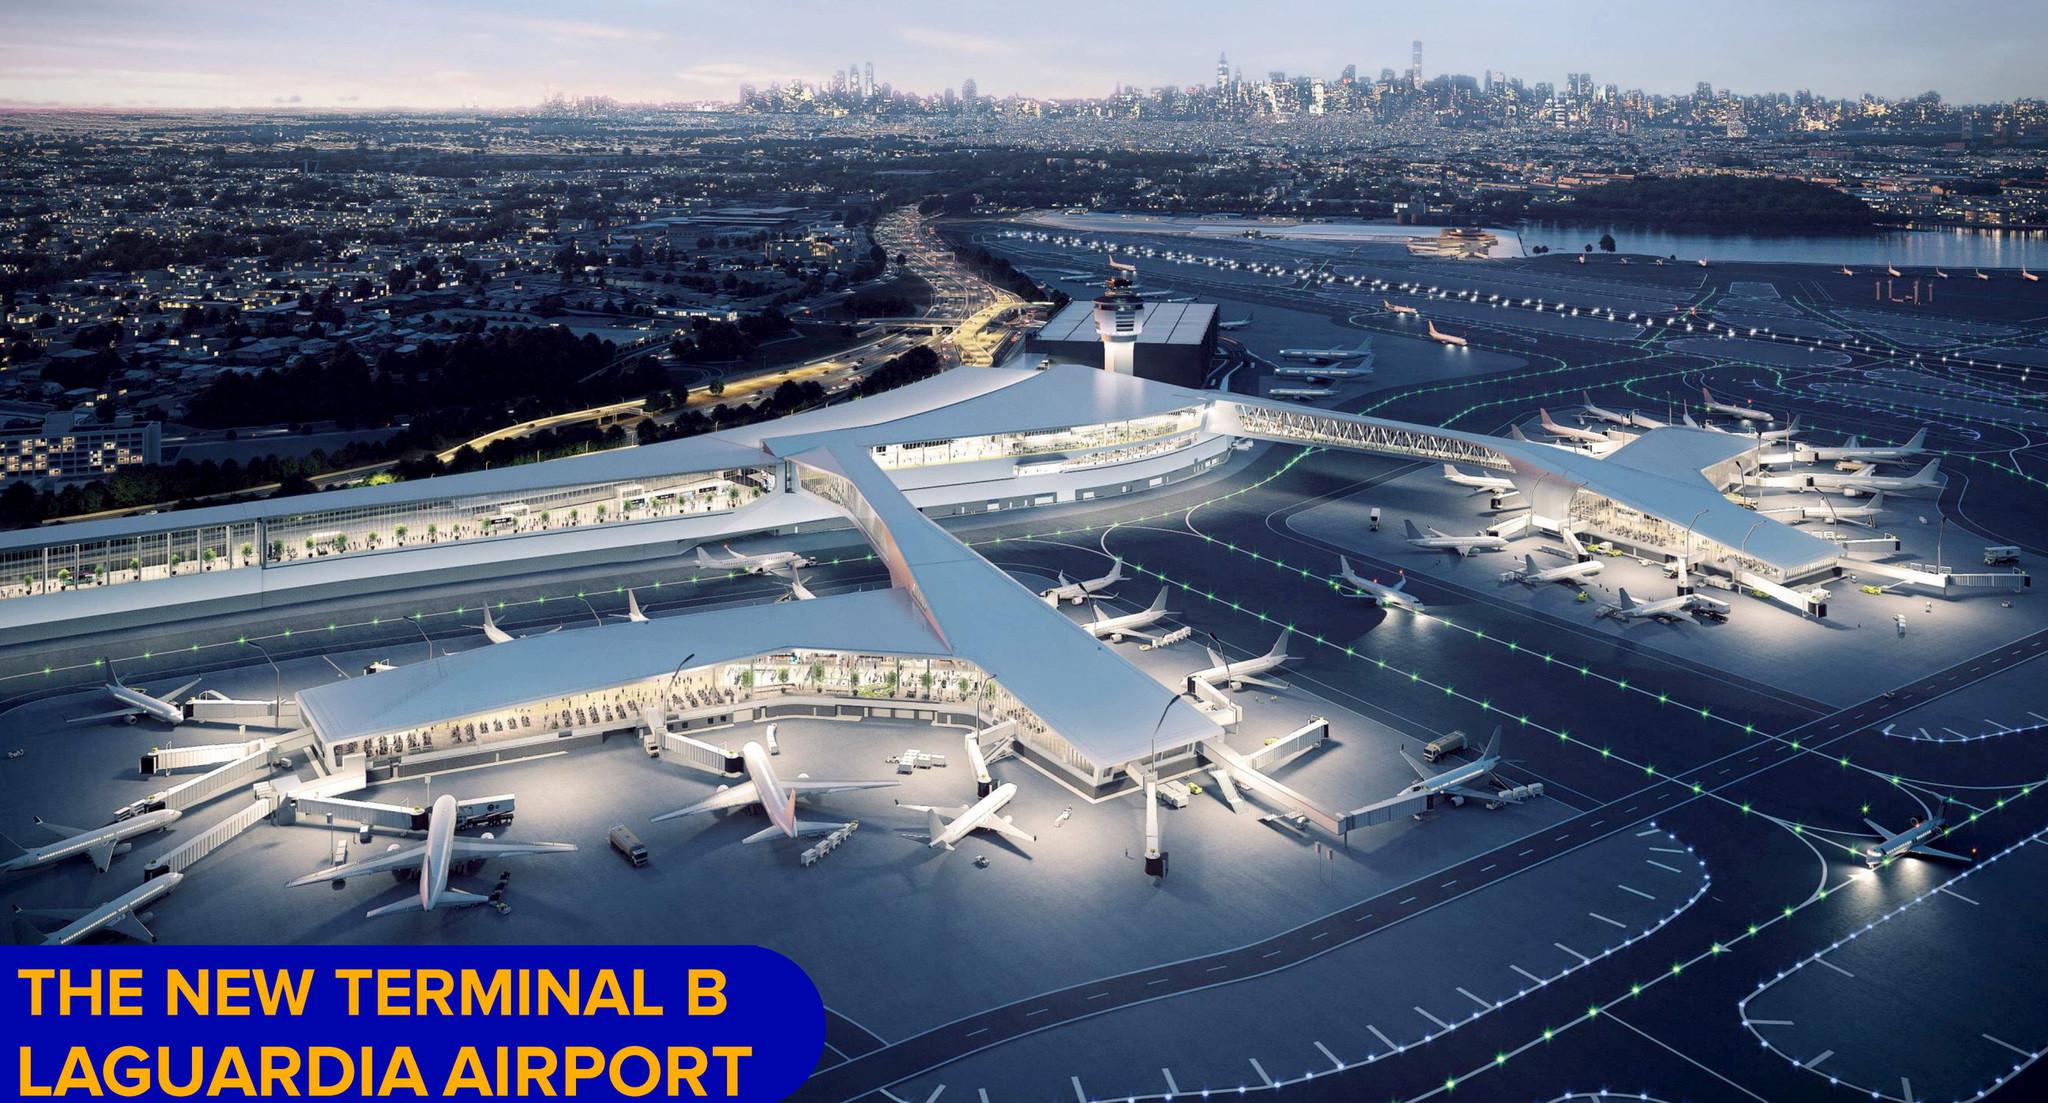 Coronavirus strains NYC's $8B LaGuardia Airport rebuilding project